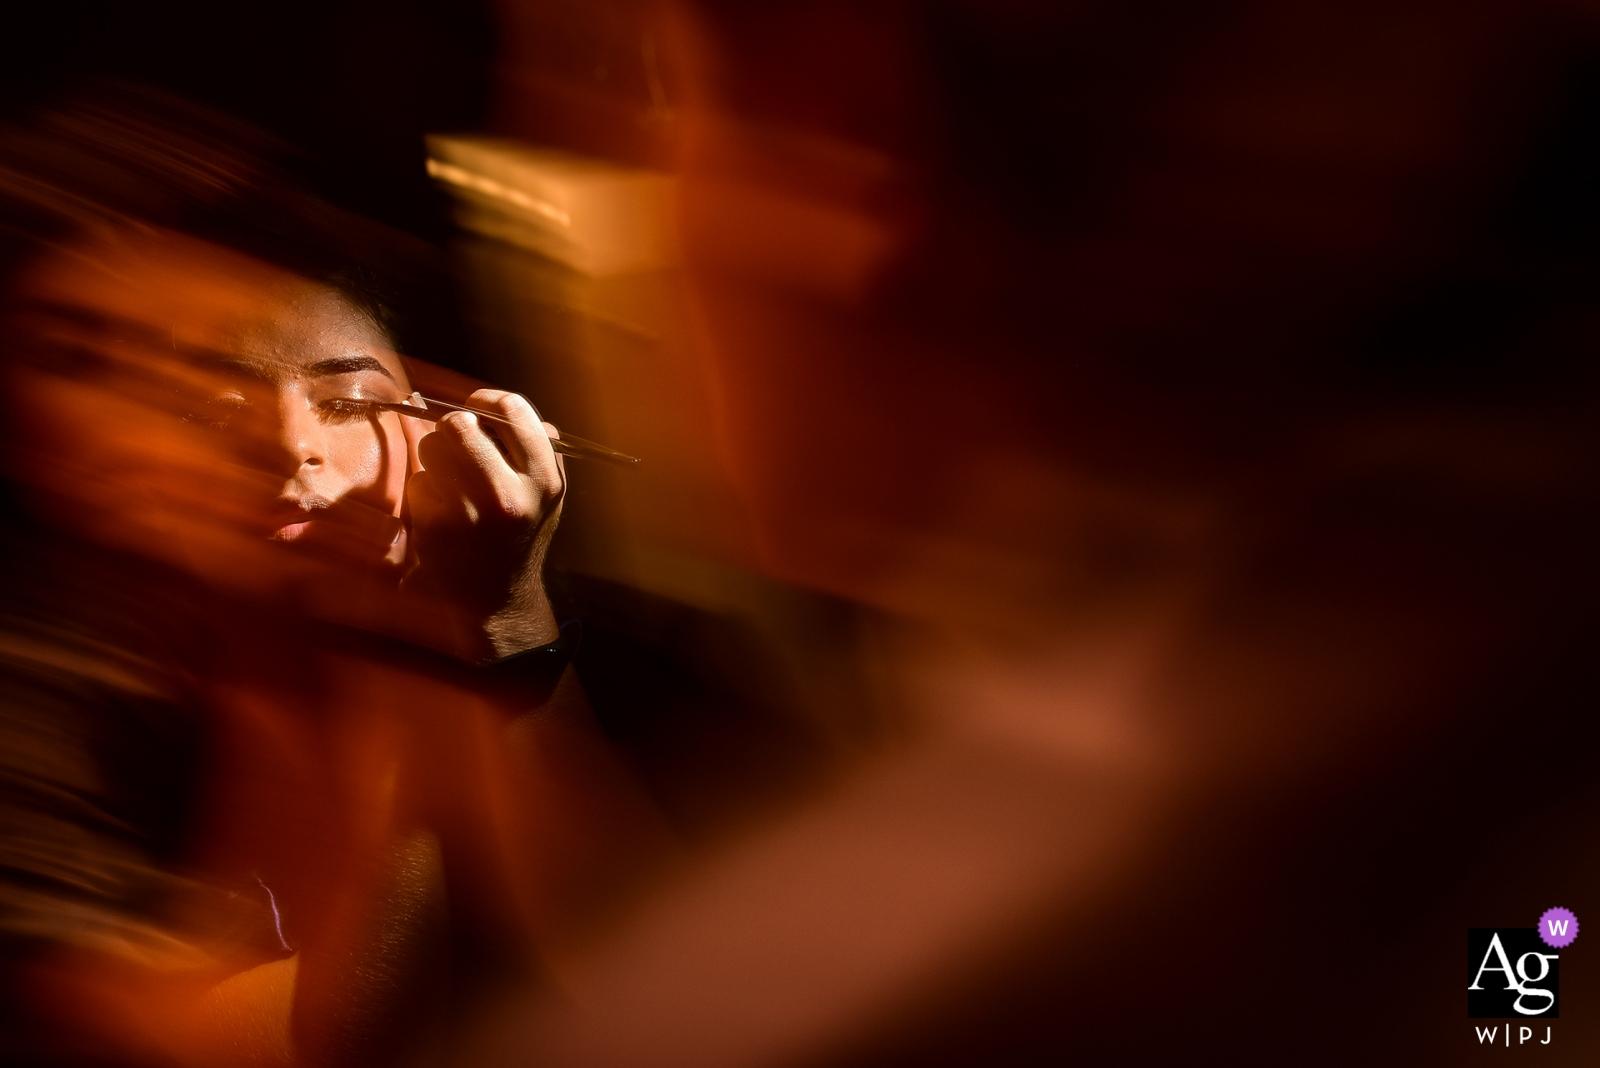 Vinicius Fadul is an artistic wedding photographer for São Paulo